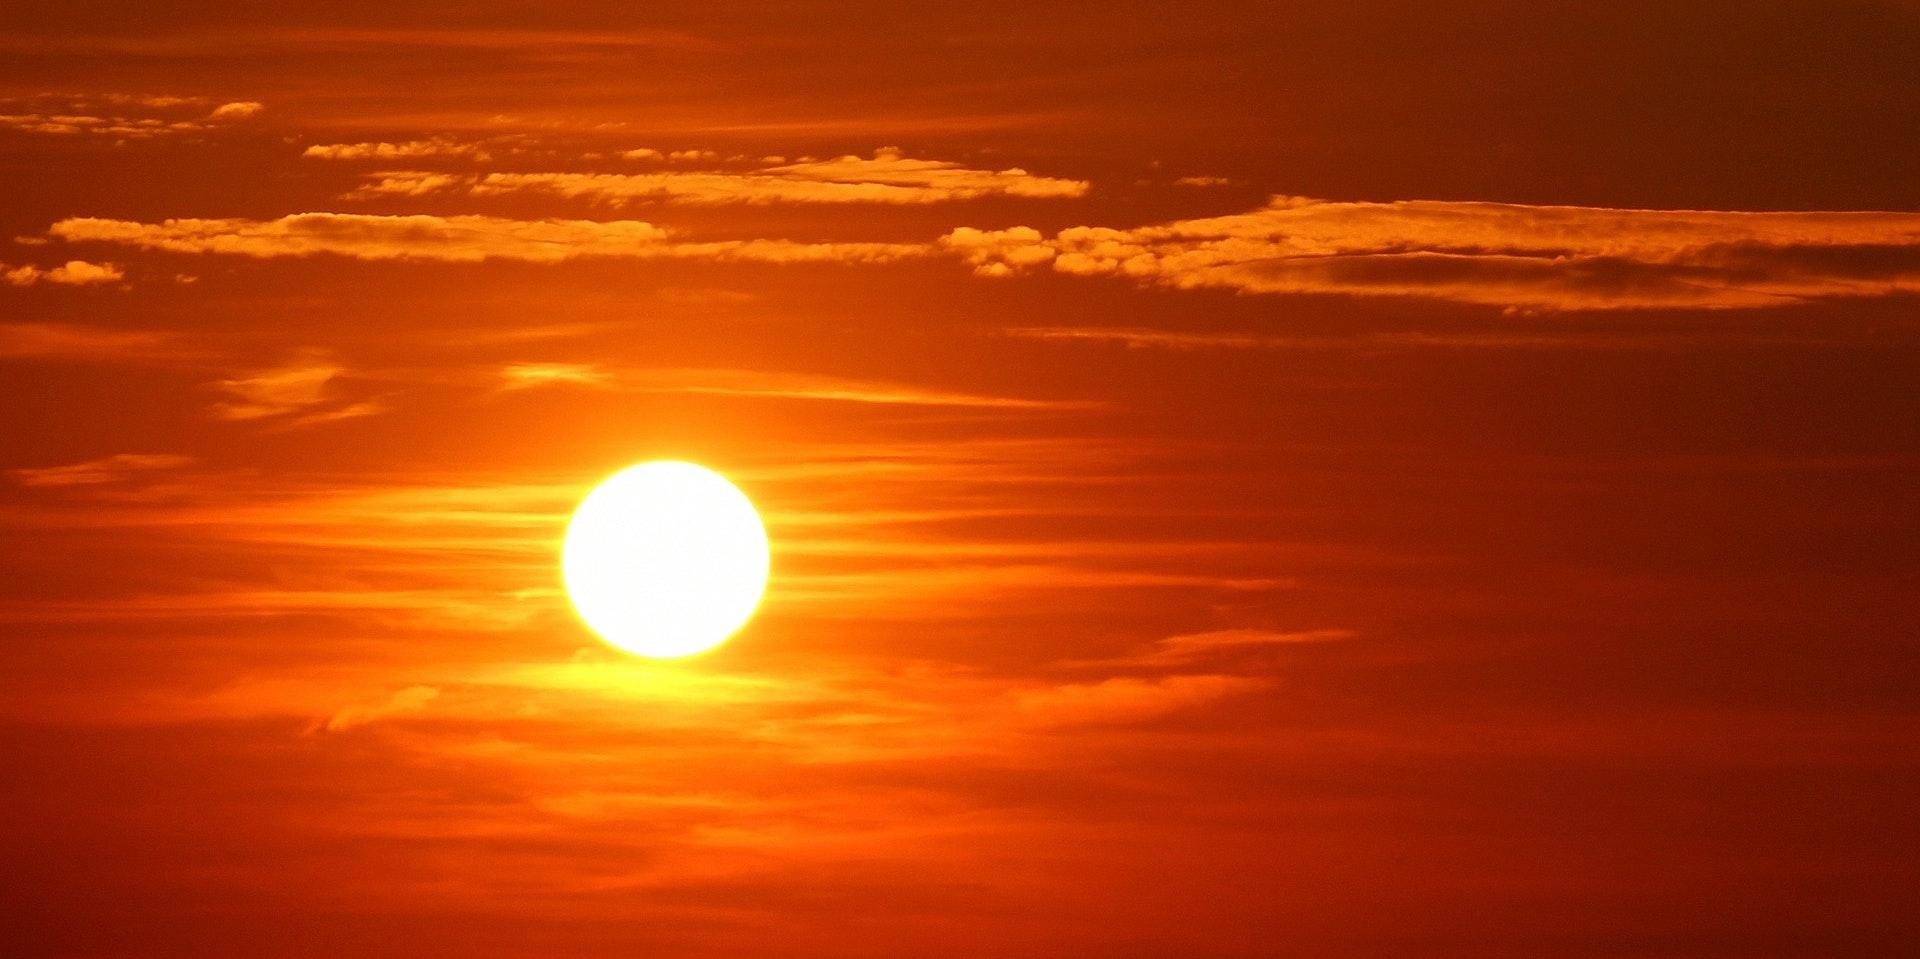 solar engineering stratosphere sulfur dioxide